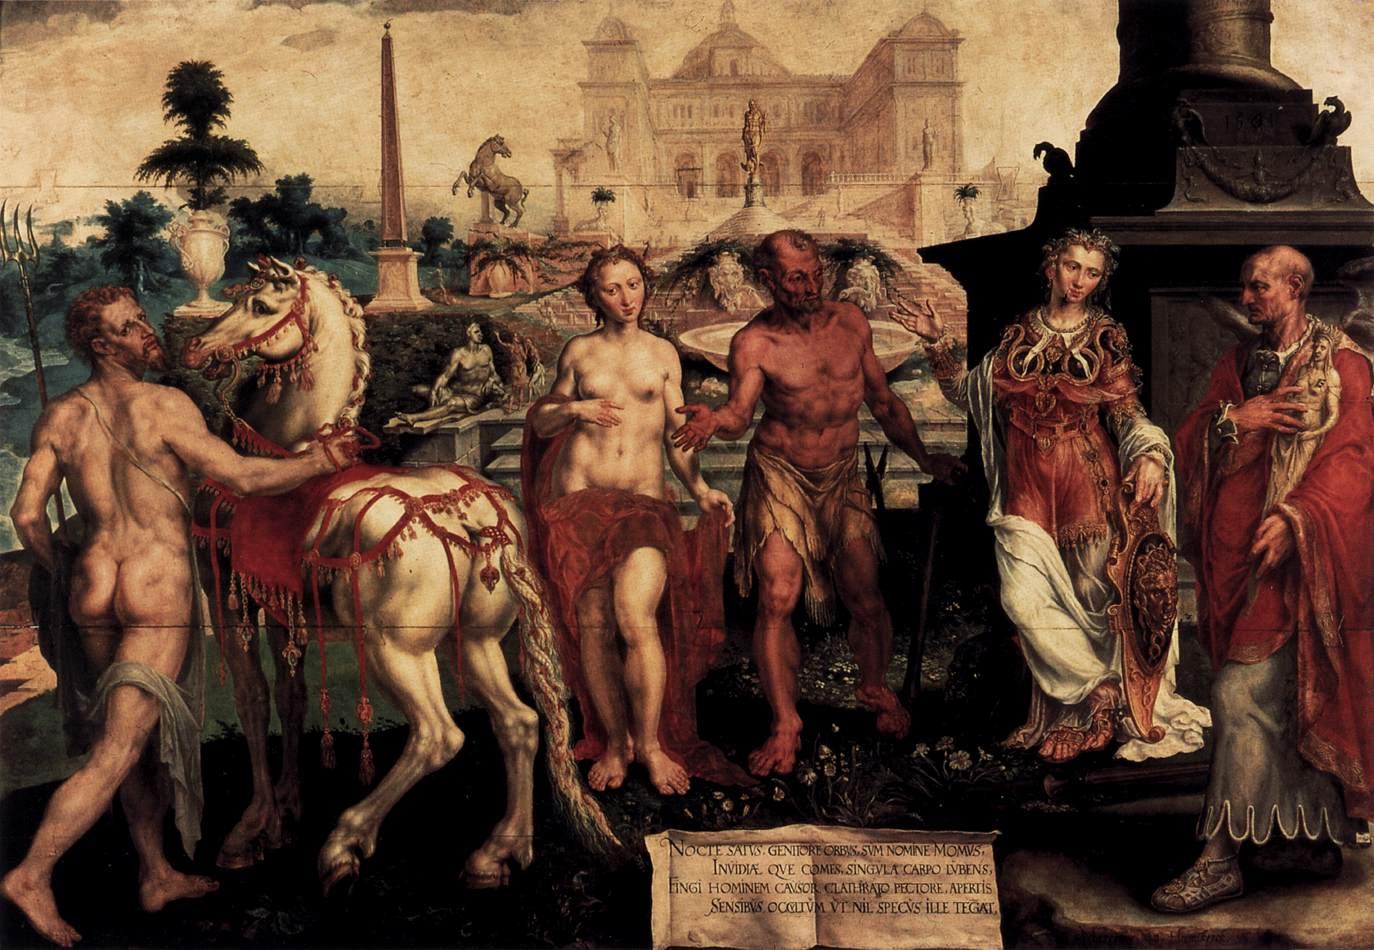 momus-criticizes-the-gods-creations-1561.jpg